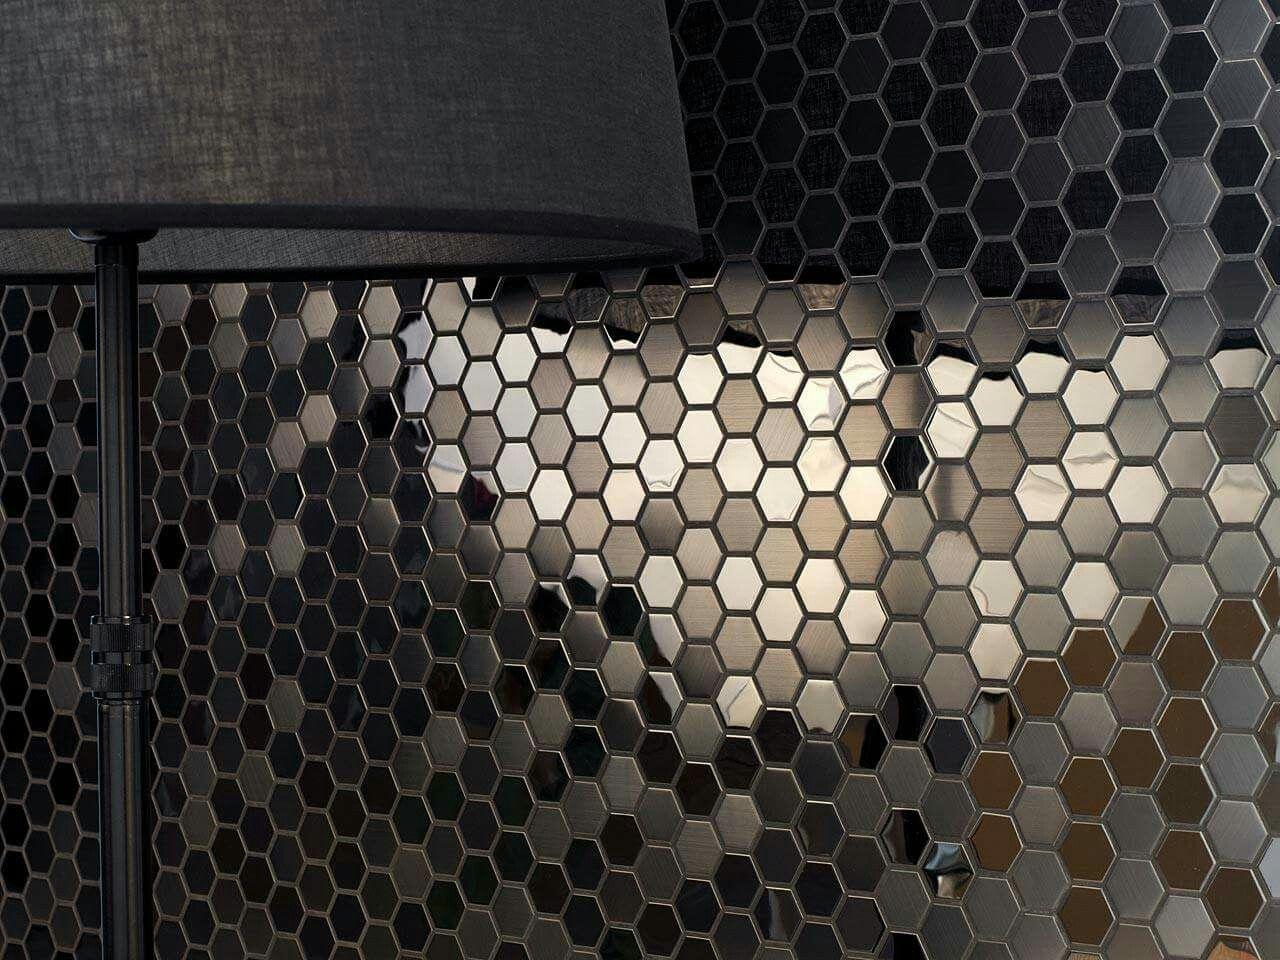 Mozaiek tegels perfect in elk interieur. mozaiek tegels, mozaiek ...